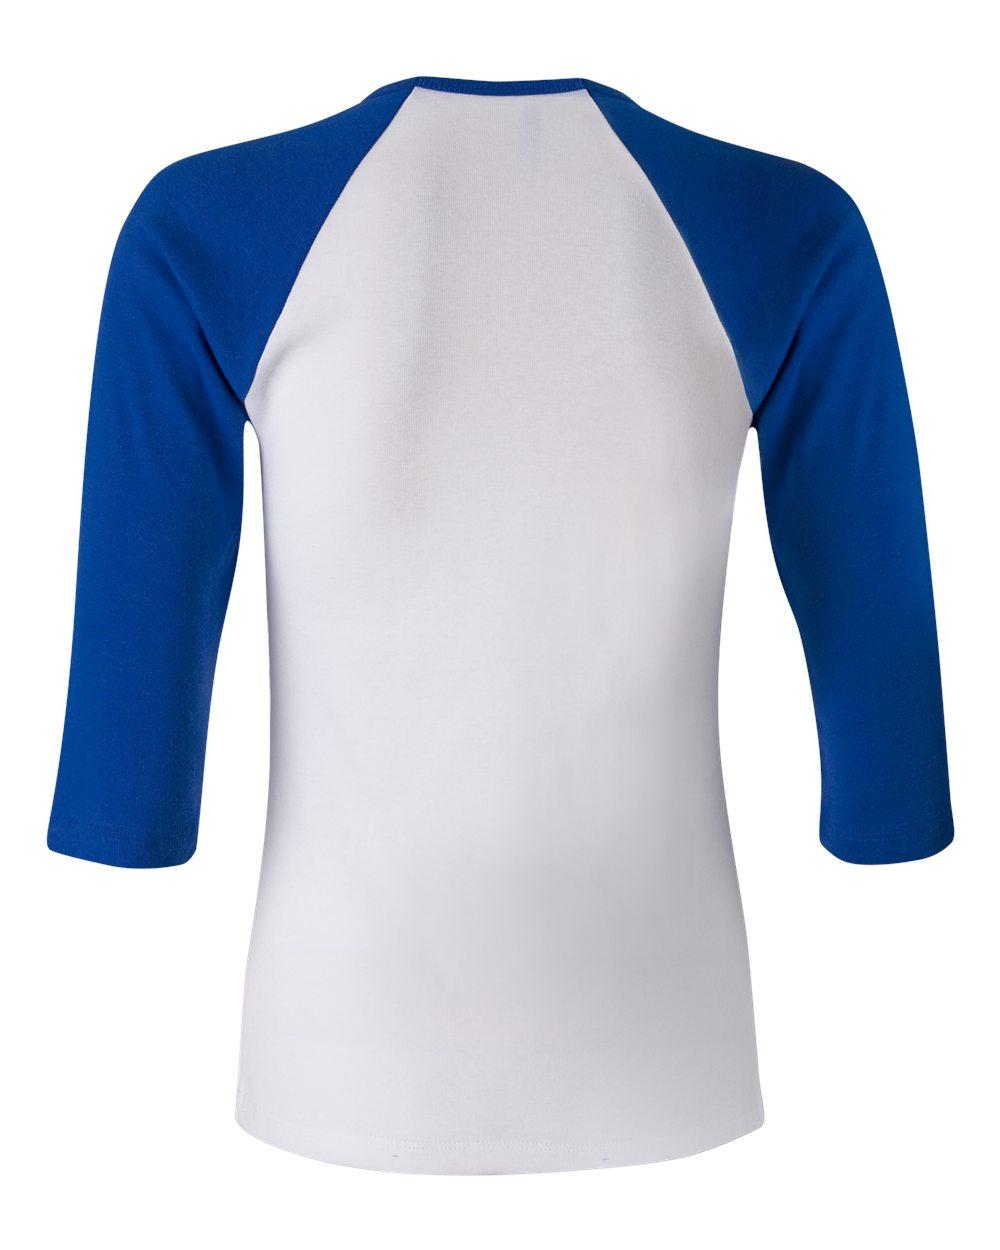 Bella-Canvas-Womens-Stretch-Rib-3-4-Sleeve-Contrast-Raglan-T-Shirt-B2000 thumbnail 29